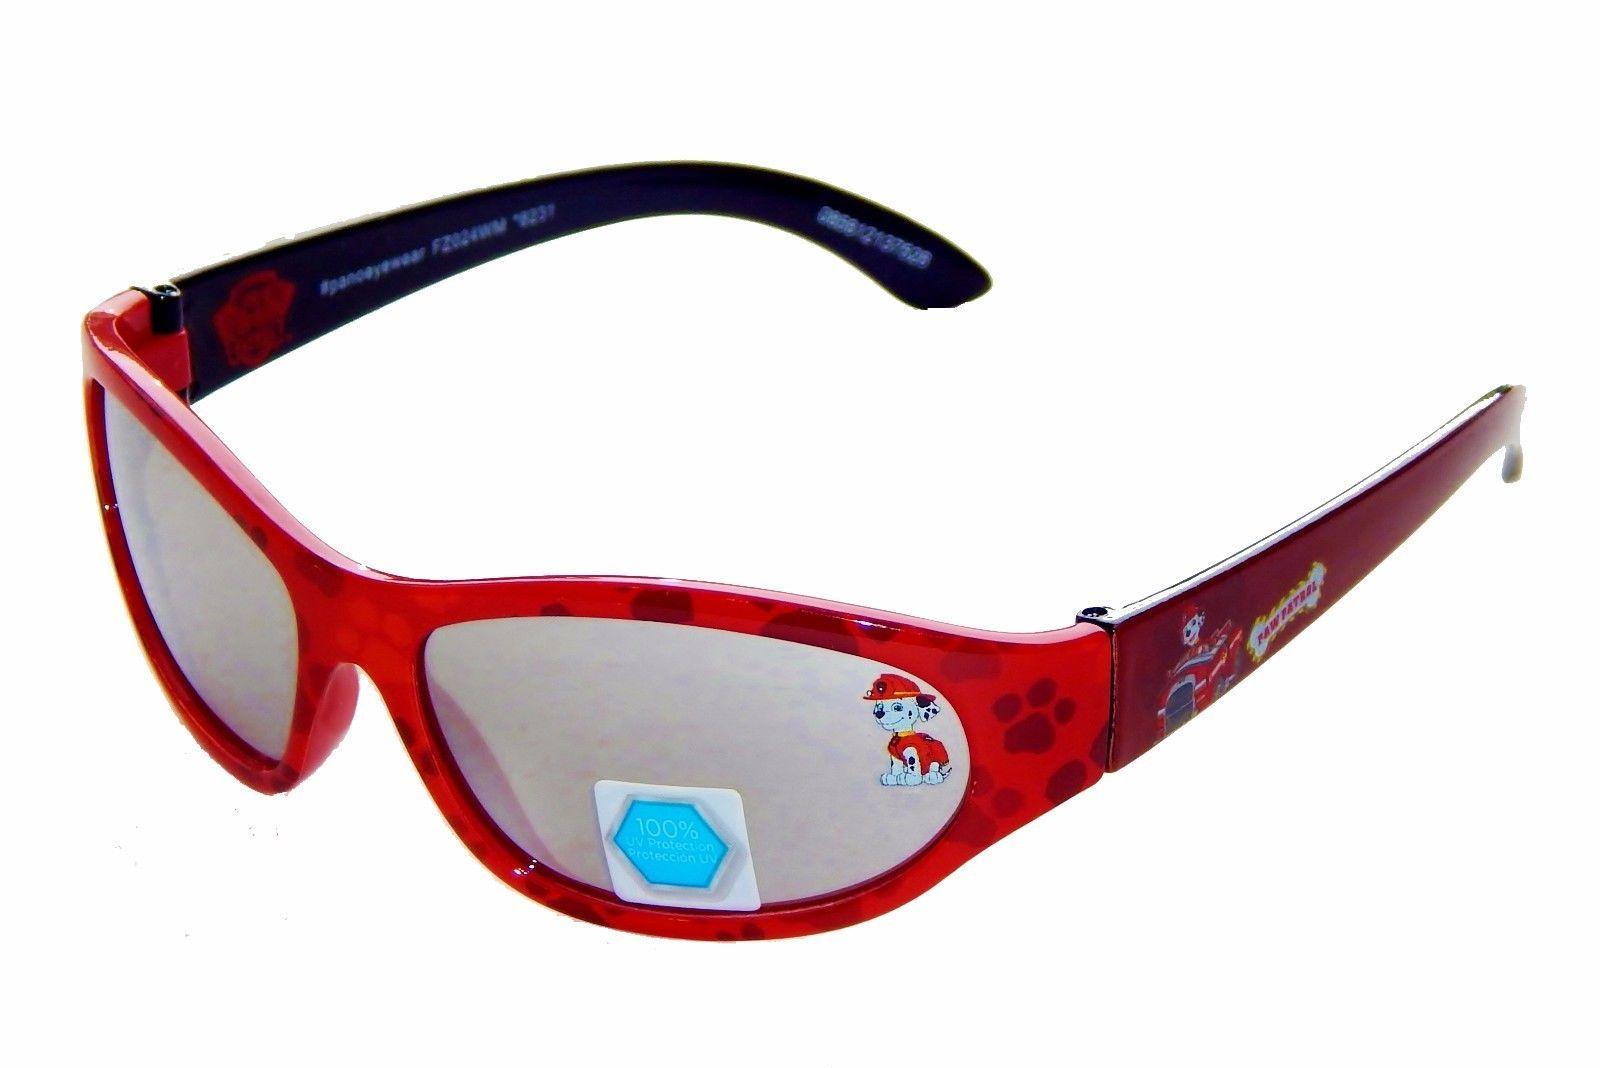 07f791d28790 PAW PATROL MARSHALL Nickelodeon Boys 100%UV Shatter Resistant Sunglasses  NWT $13 - $8.90 - $17.80